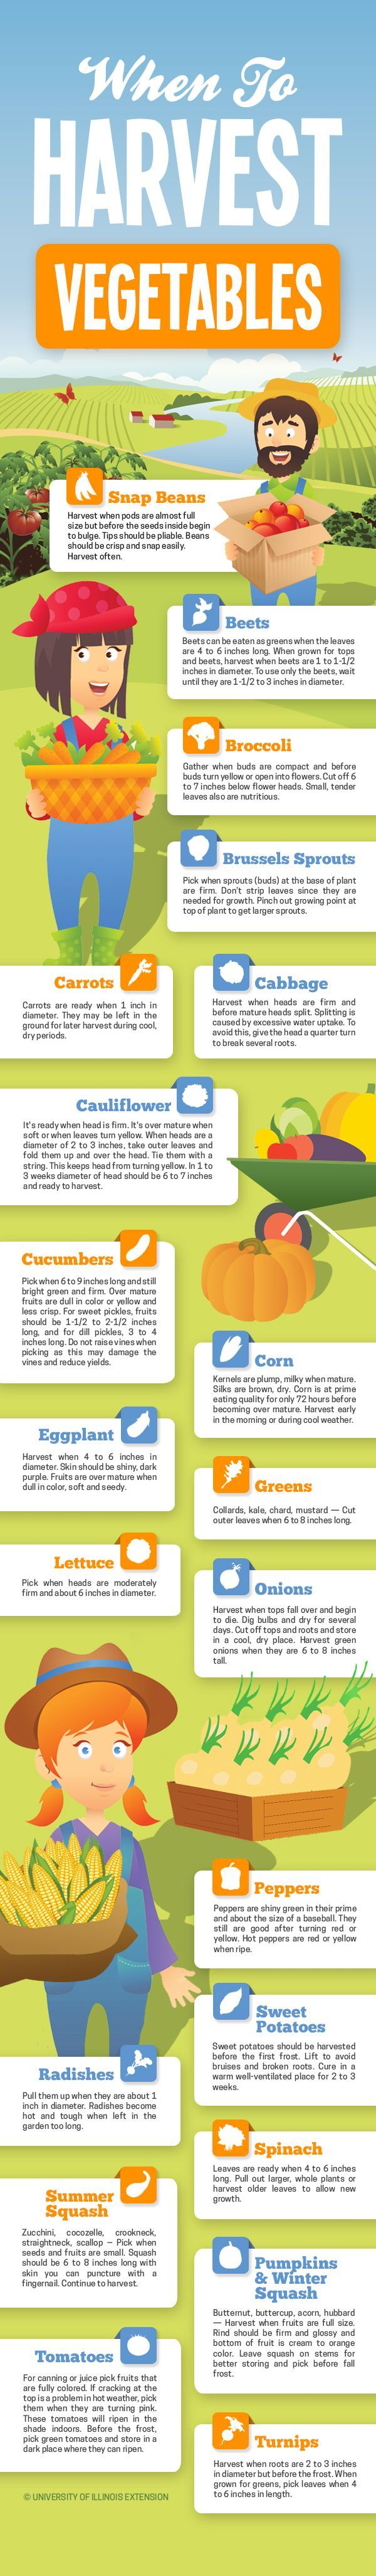 "Handy infographic for gardeners! ""When to Harvest Vegetables"" #garden #produce #veggies #maryslocalmarket"